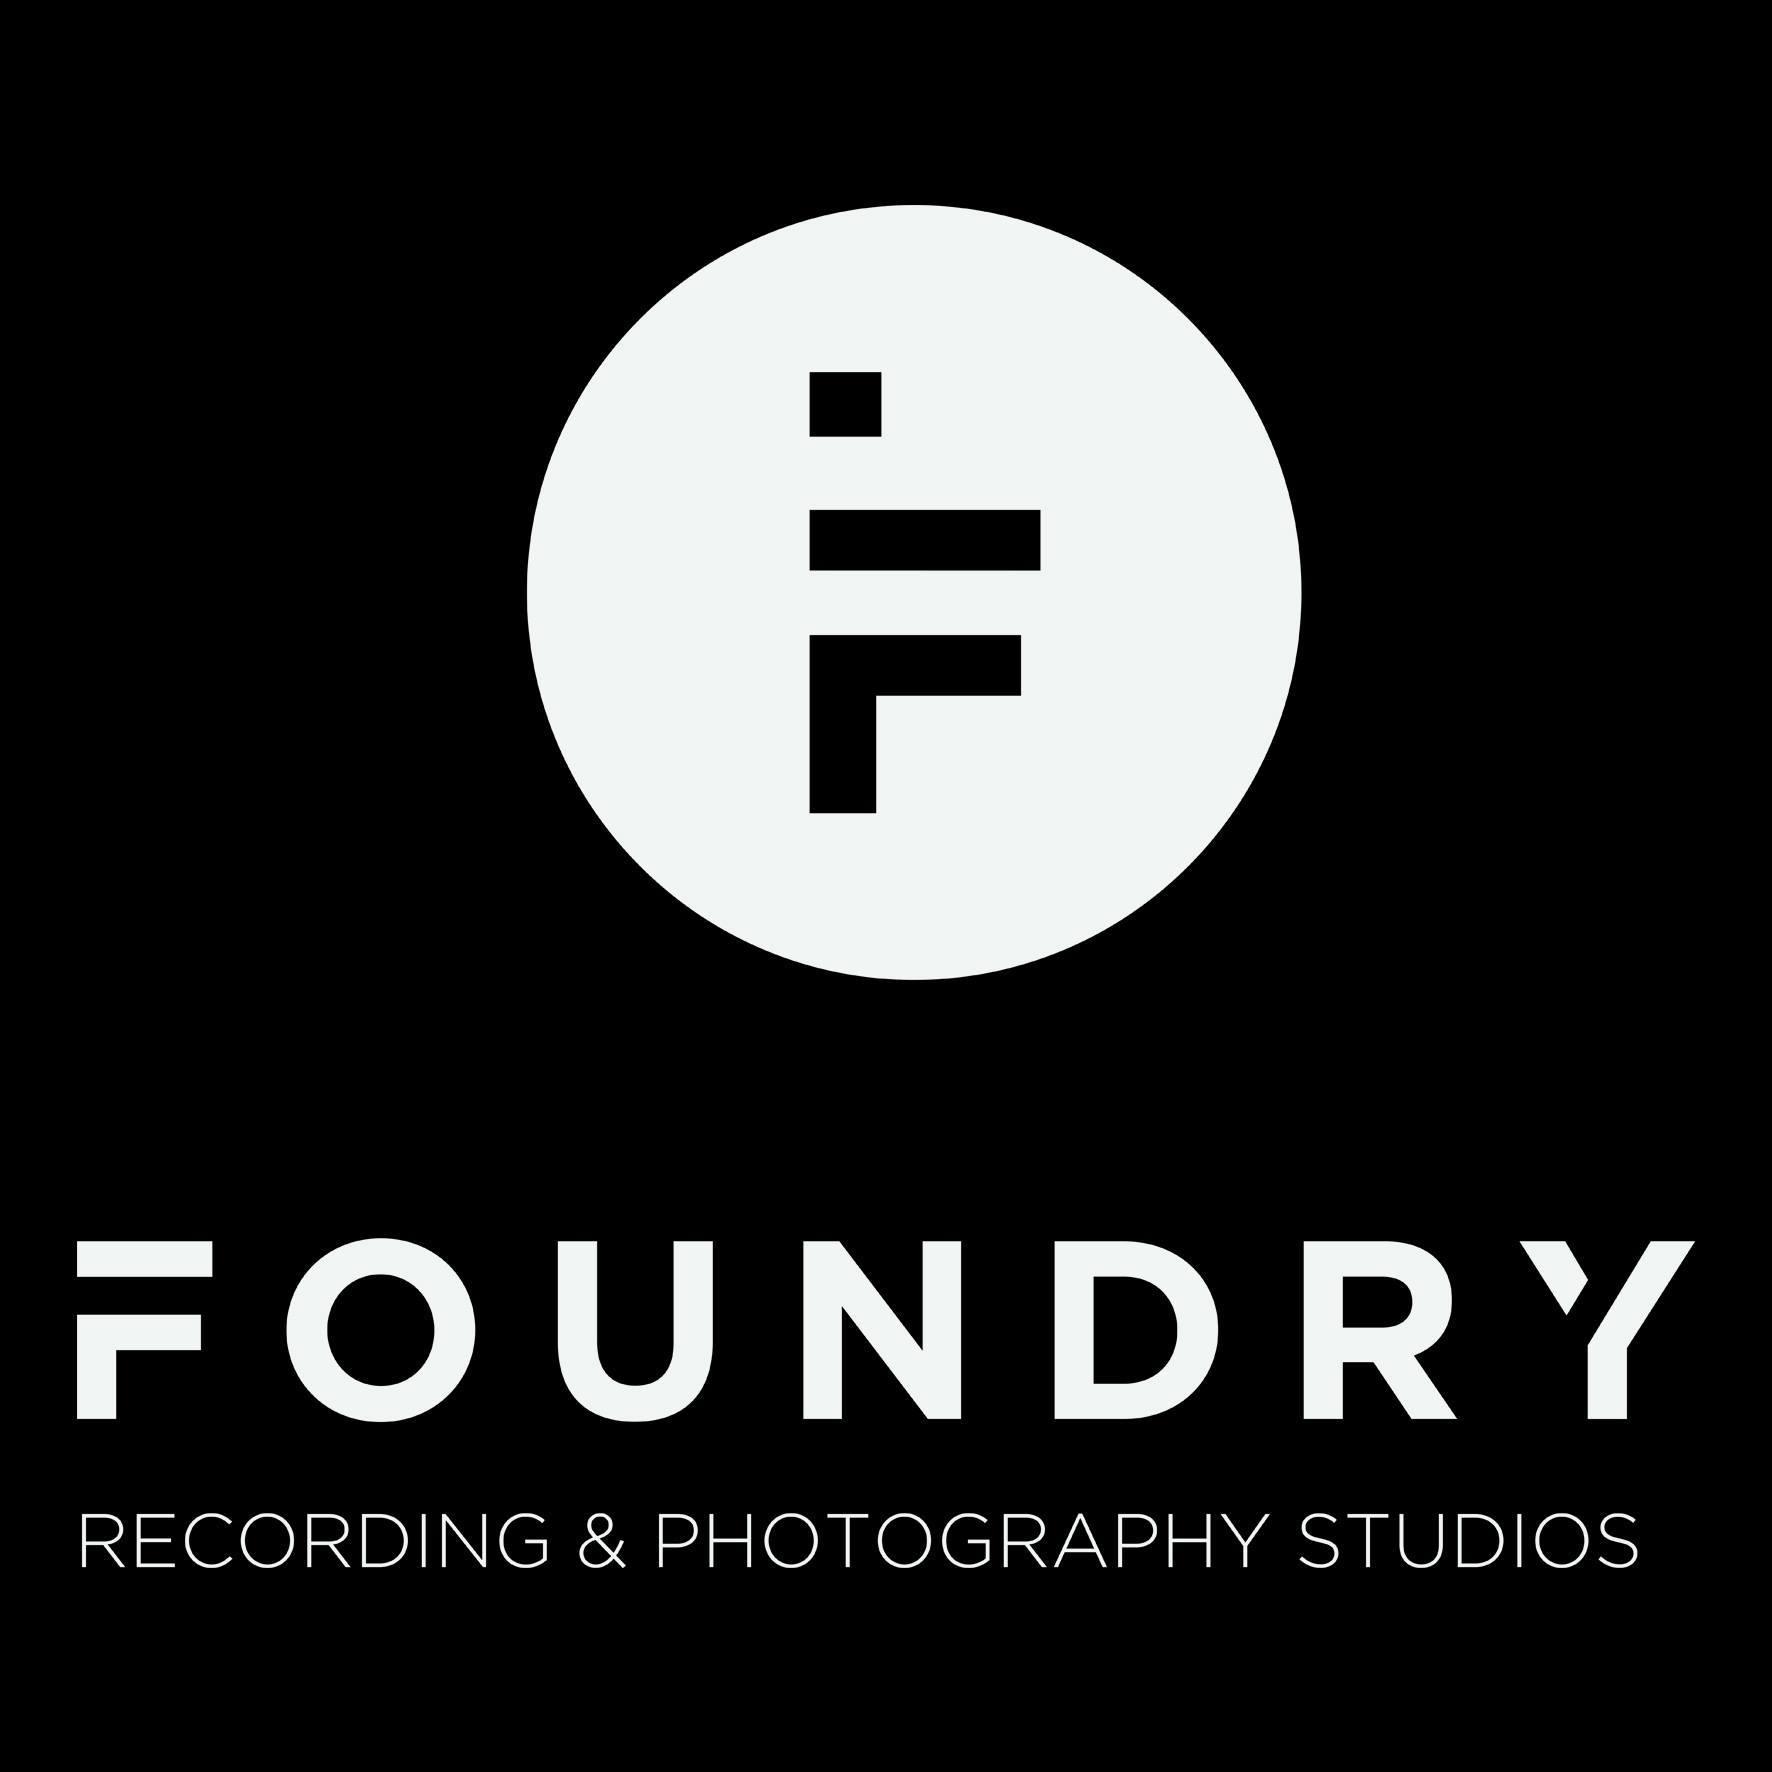 Foundry photography studio